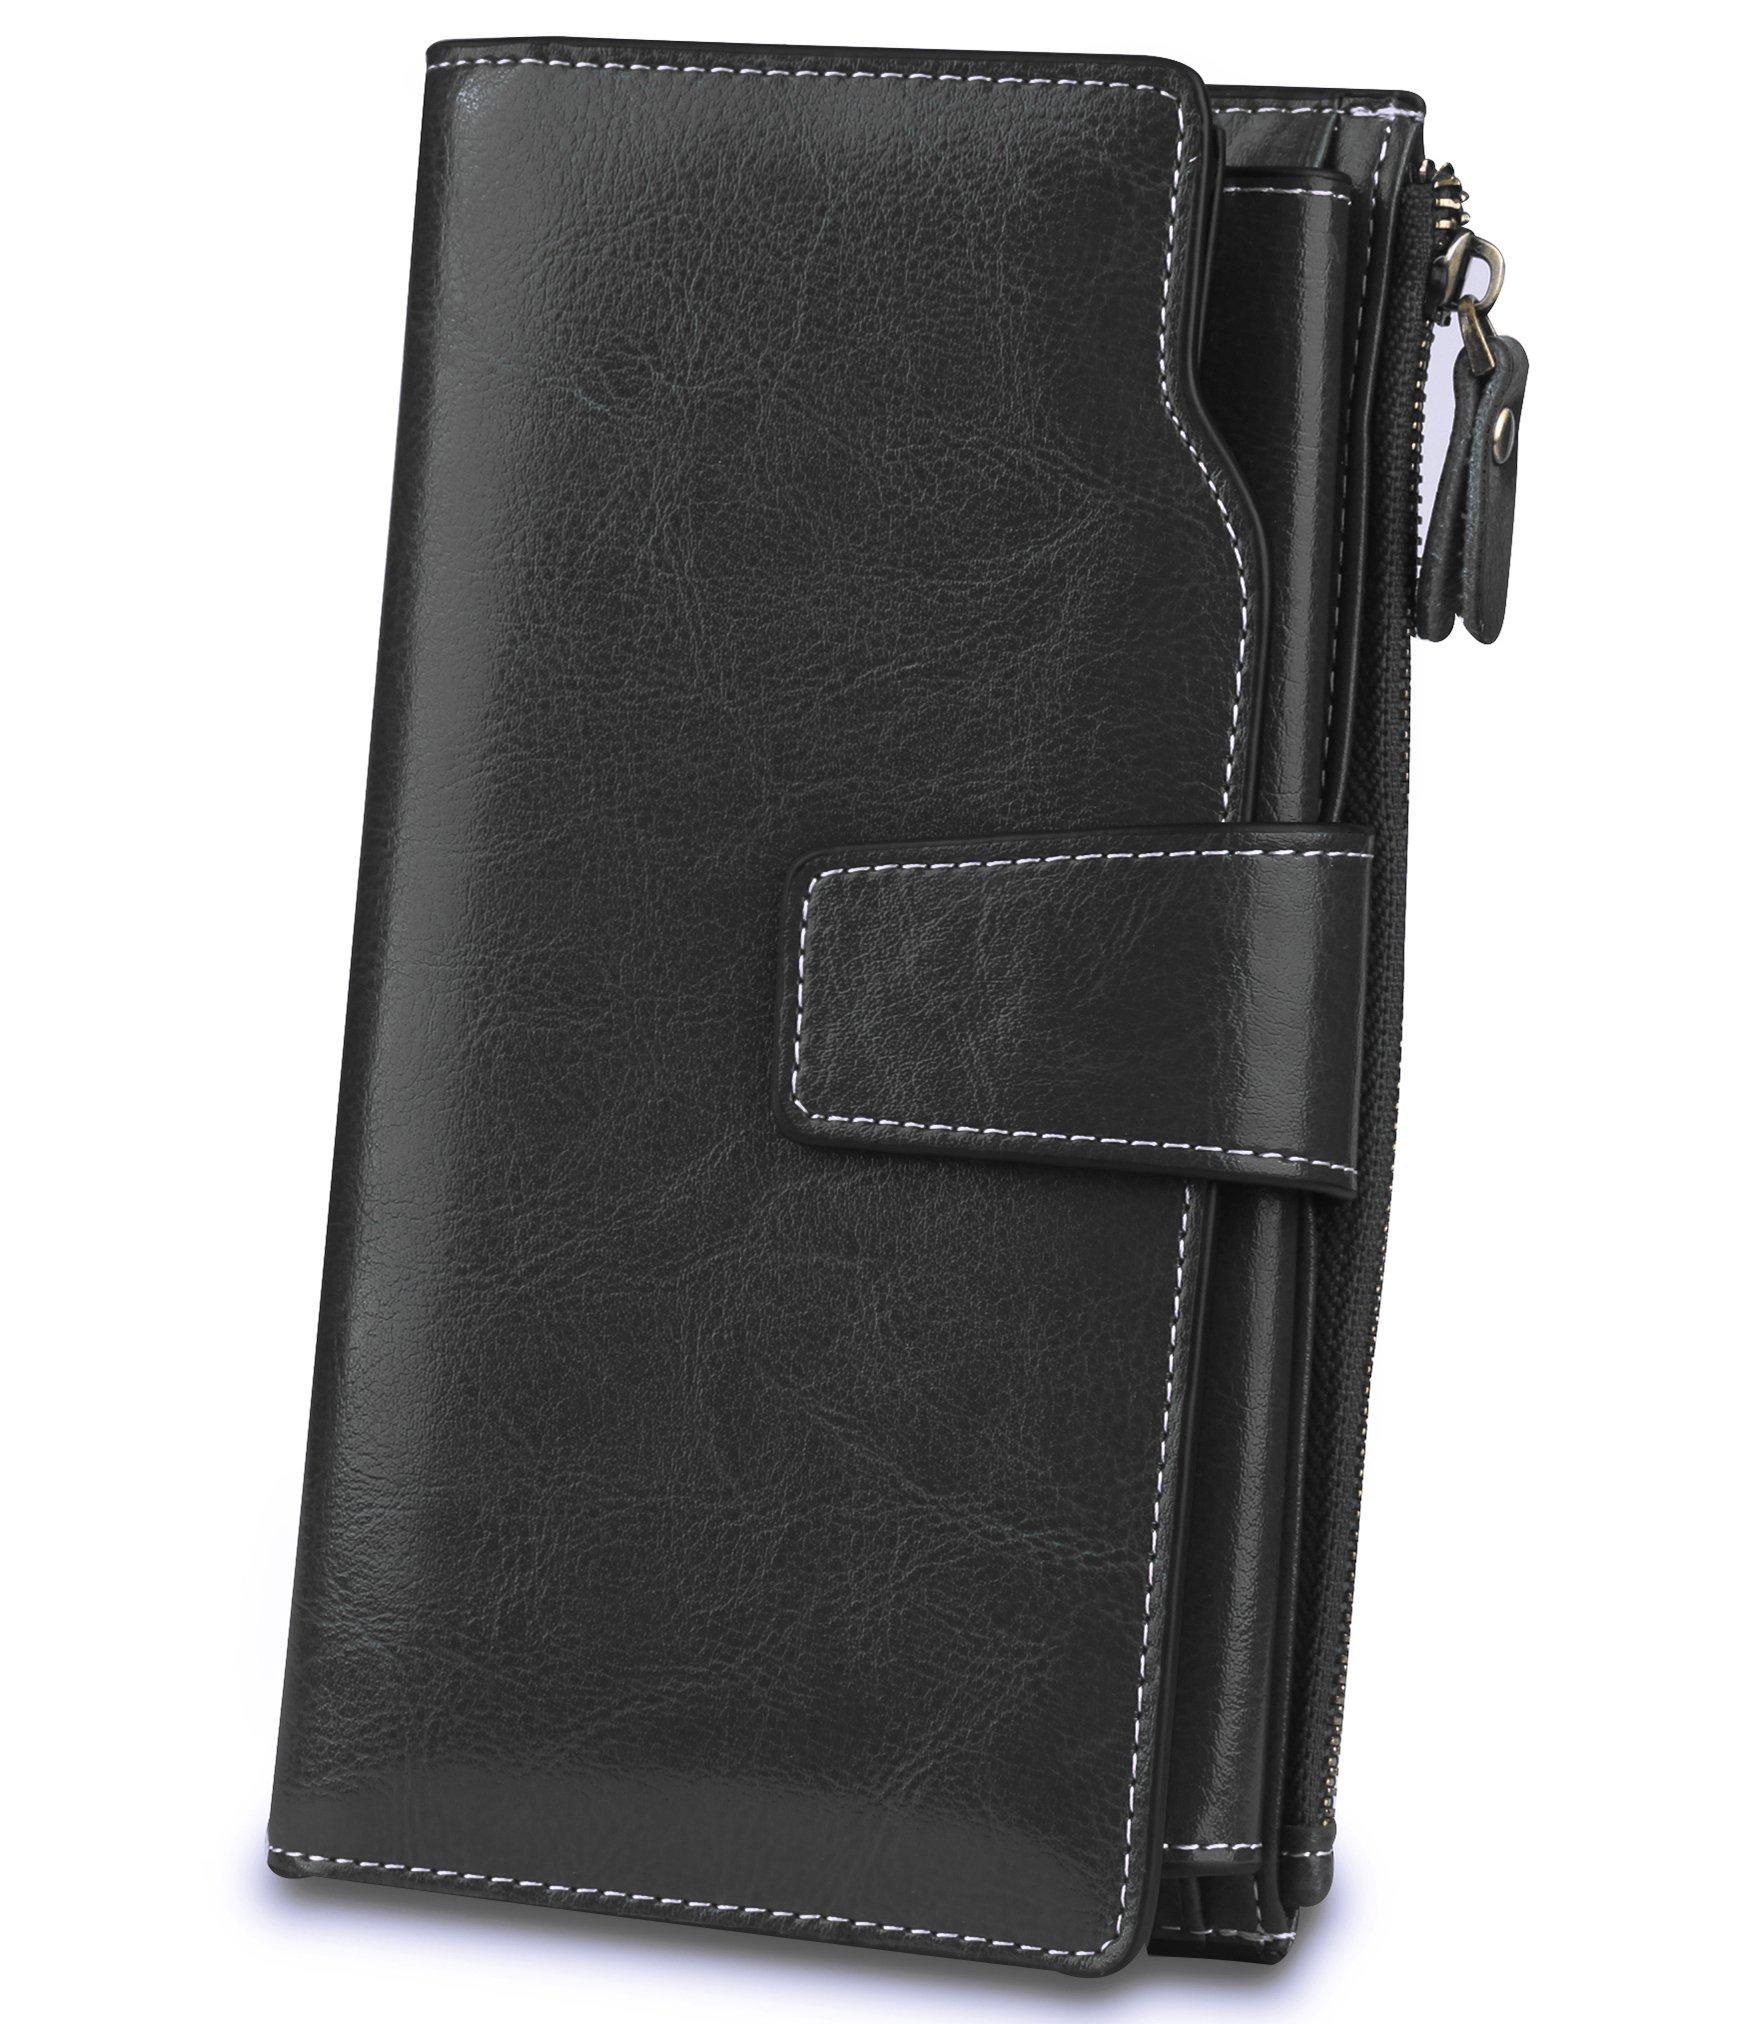 Women's Trifold Genuine Leather Wallet RFID Blocking Large Capacity Organizer Clutch Luxury Ladies Purse Credit Card Holder Black